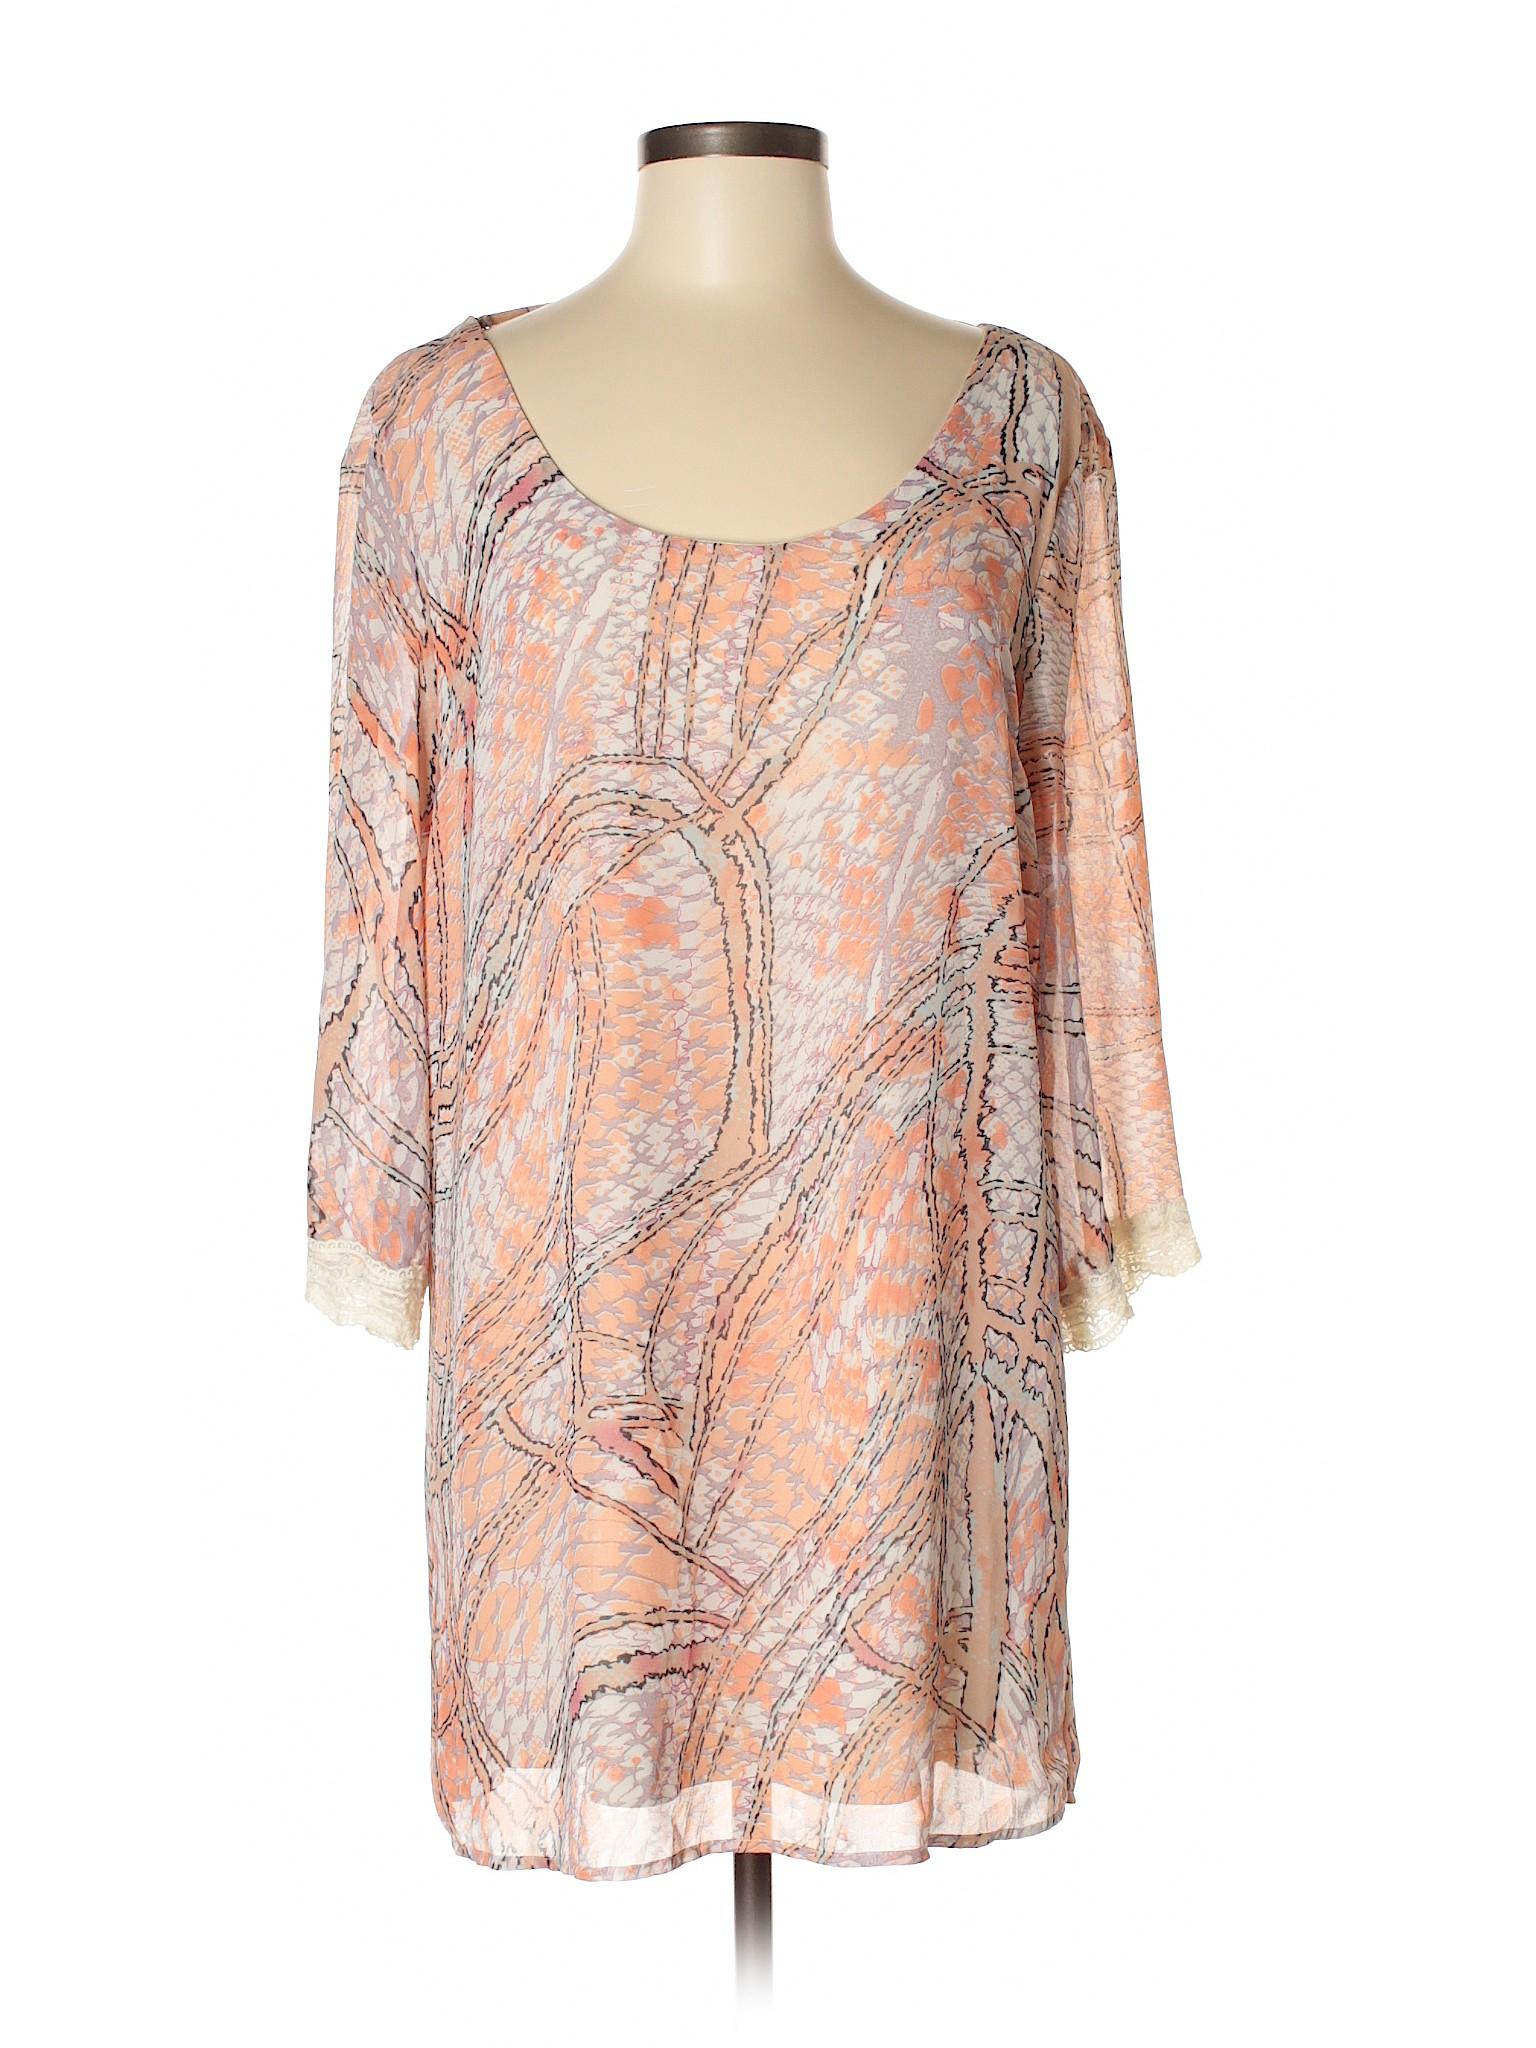 Selling AaKaa Dress Selling AaKaa Casual Casual Selling Dress qEcg4tW